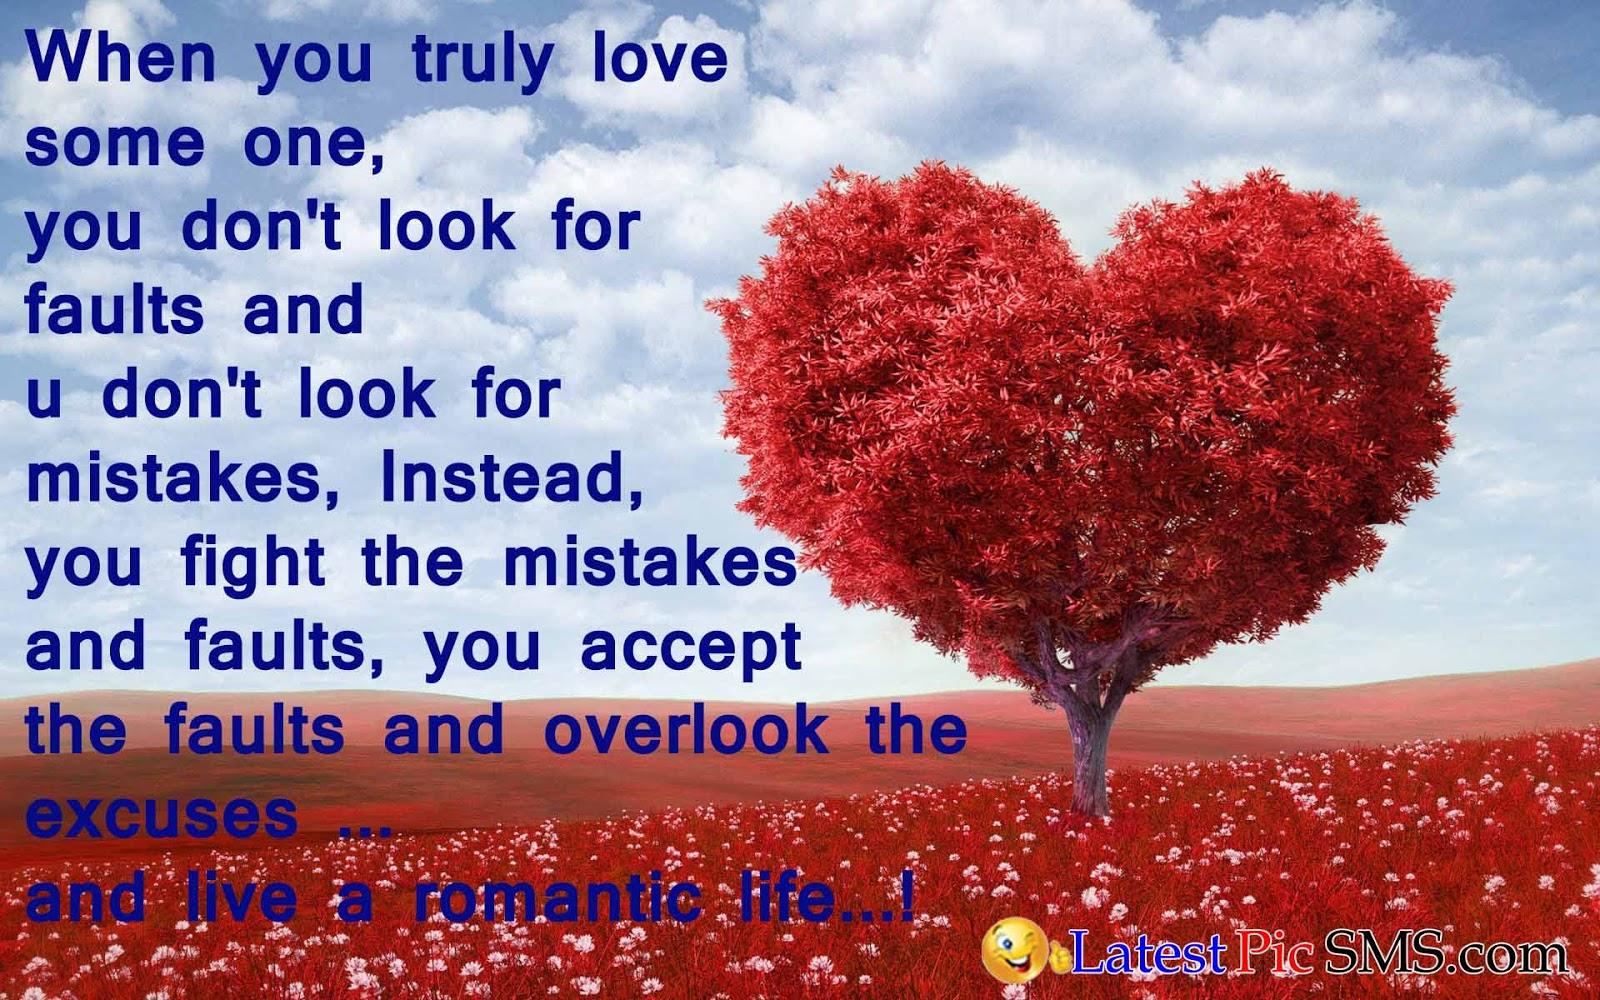 Heart Shape Tree